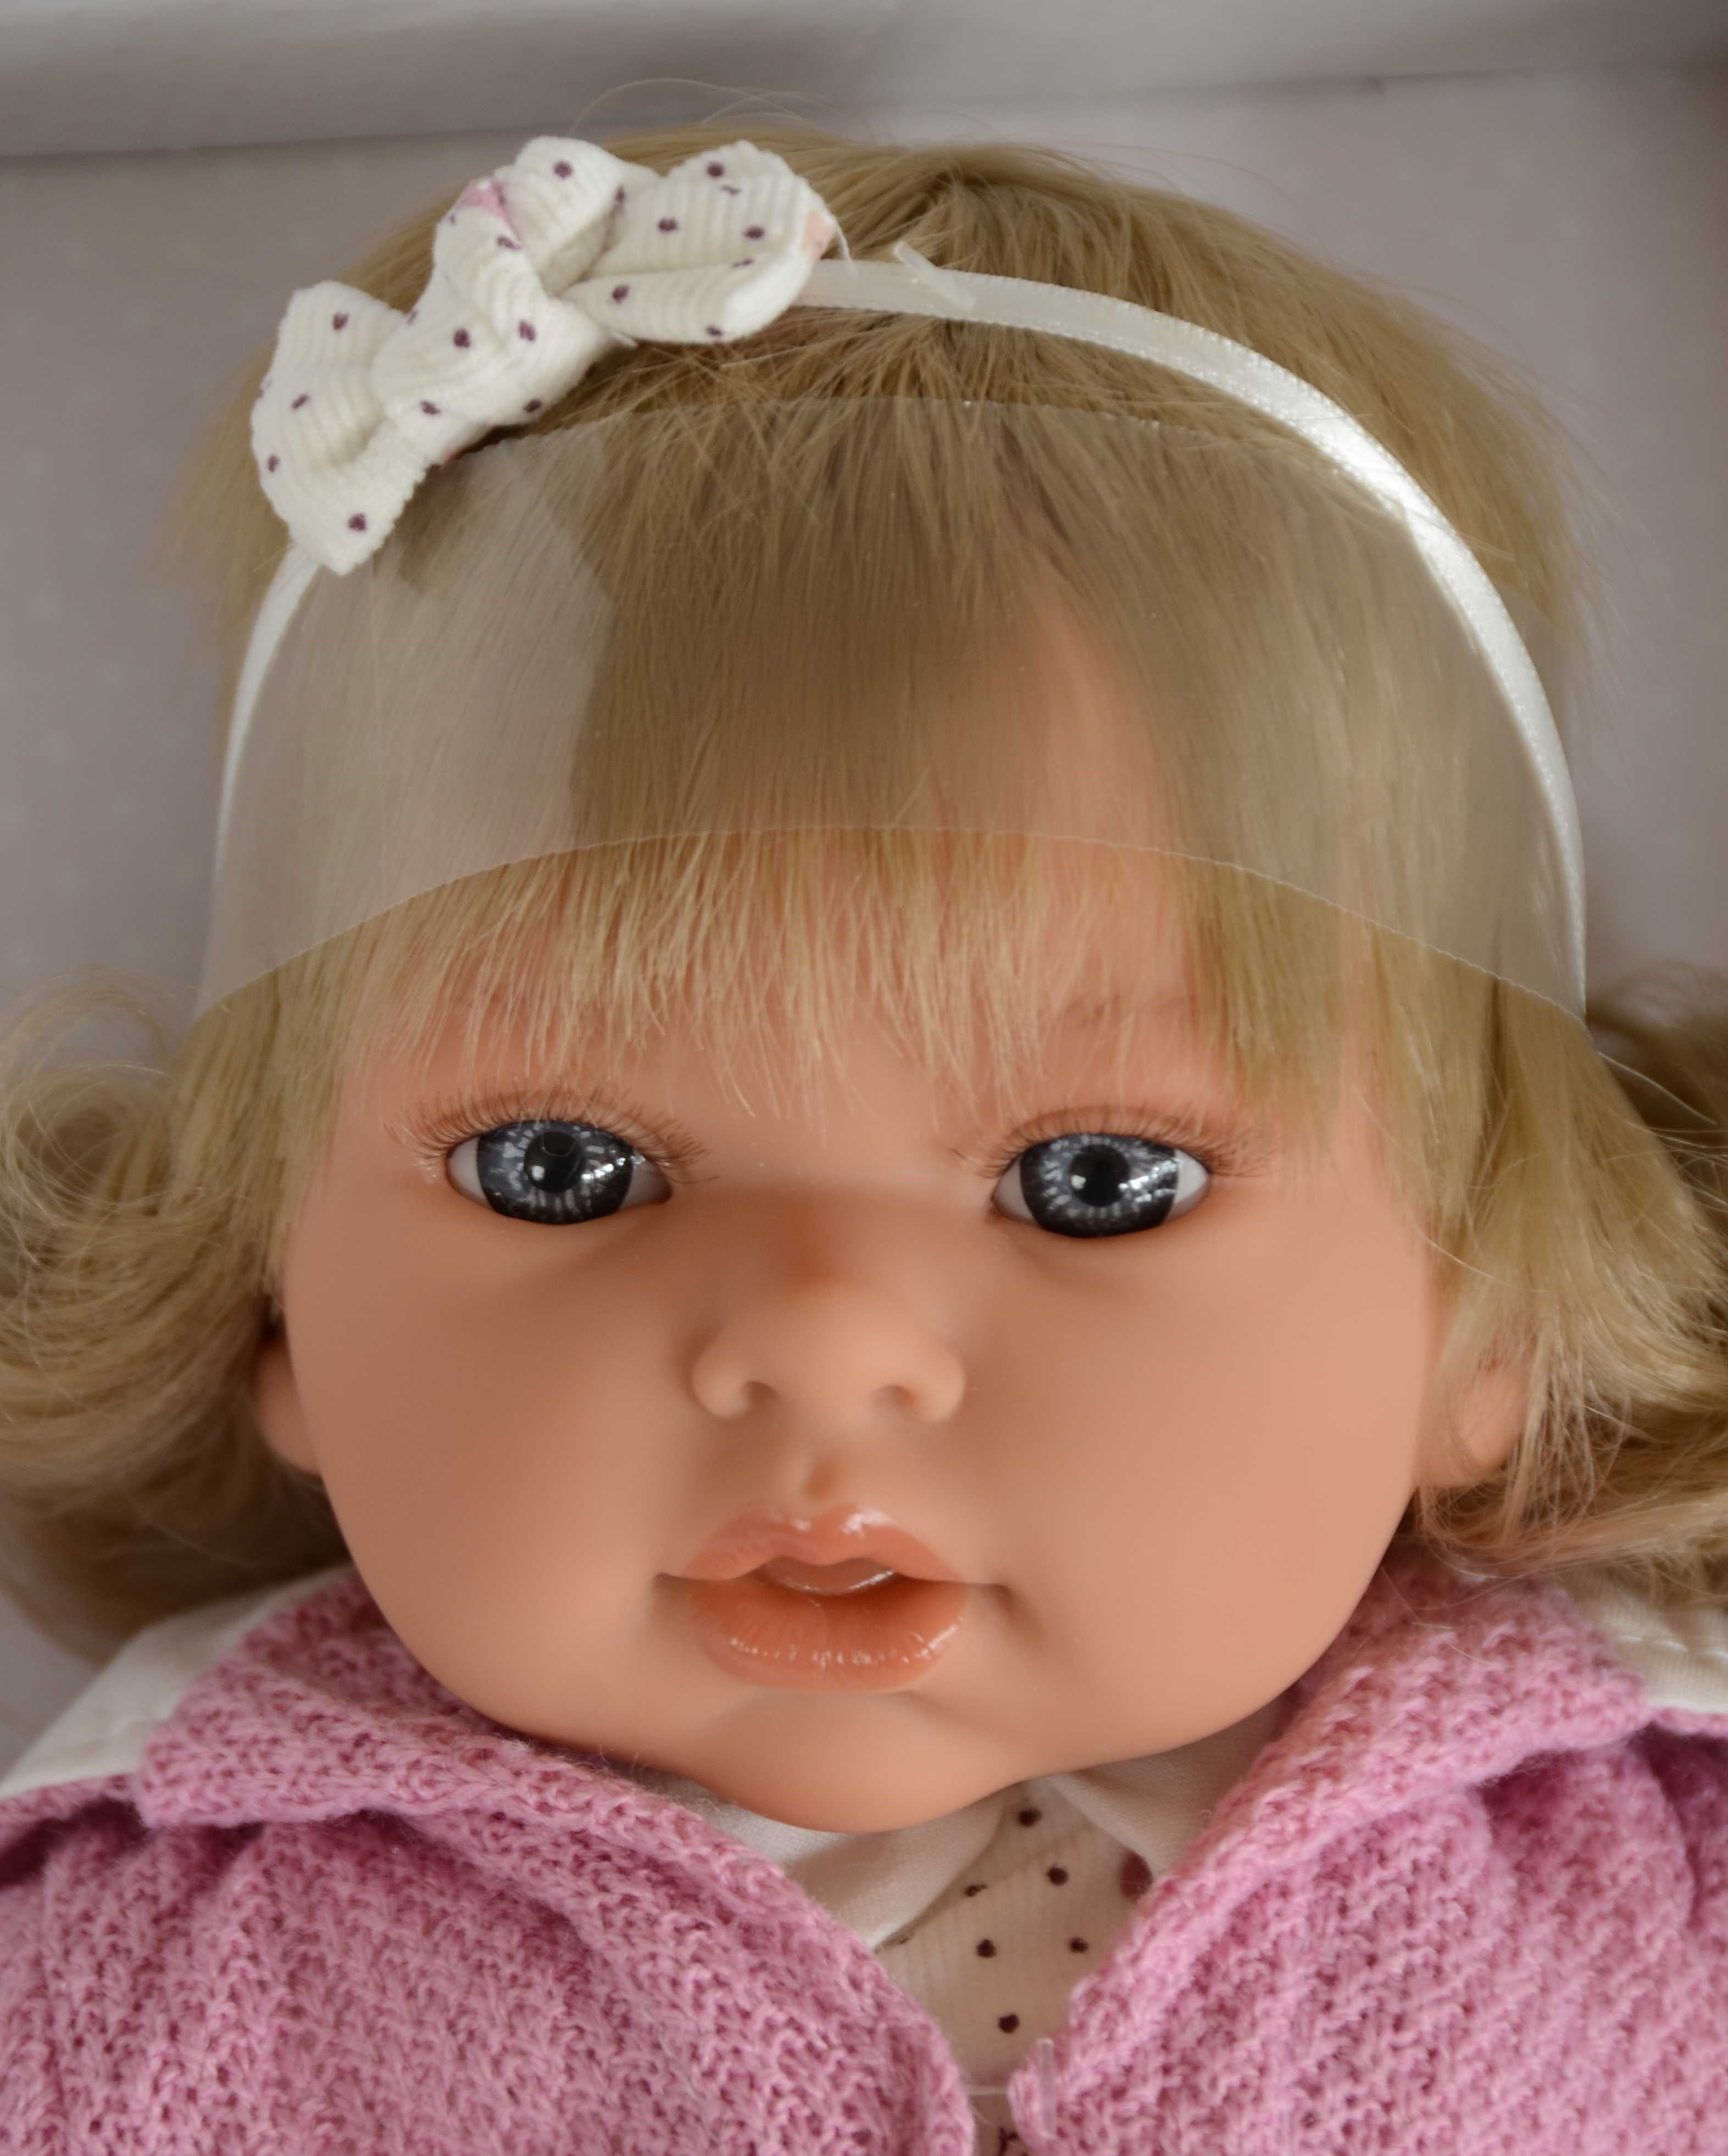 Realistická panenka Antonio Juan - holčička Any Melenita - světlé vlásky (Doprava zdarma)